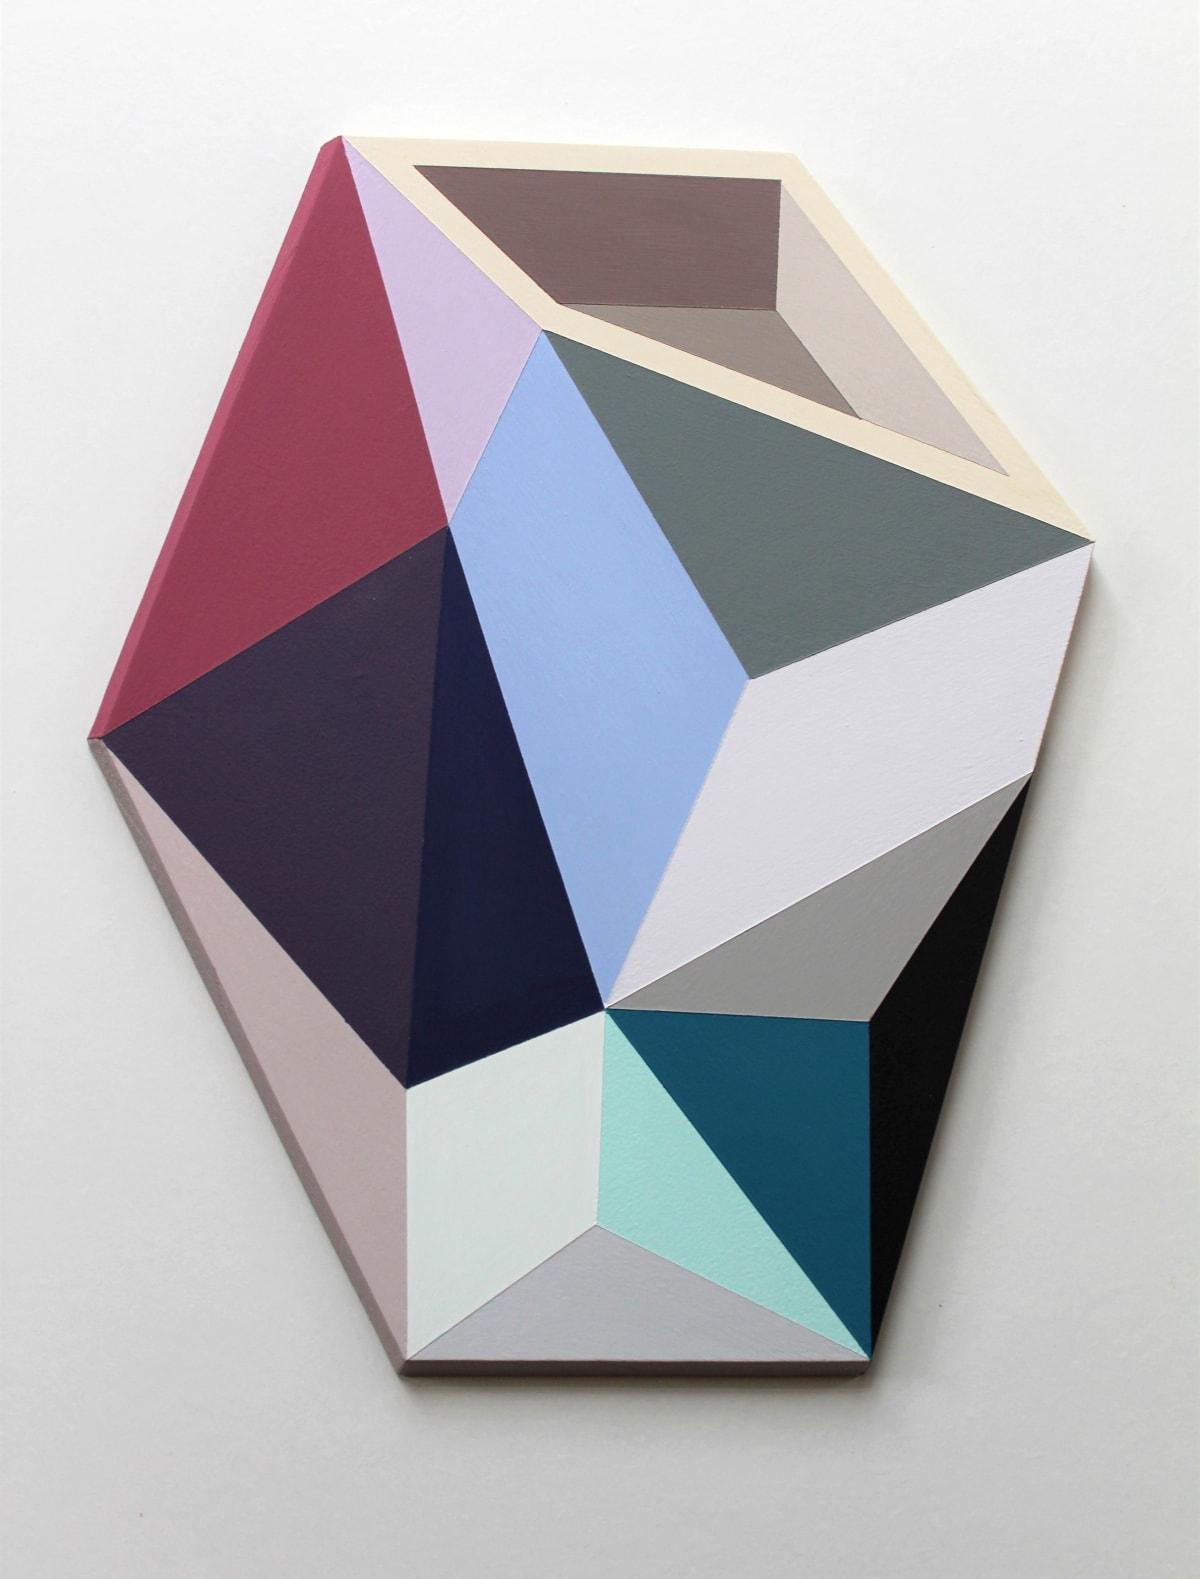 Megan Burns, Altered space 0.16, emulsion on board, 39 x 30 cm